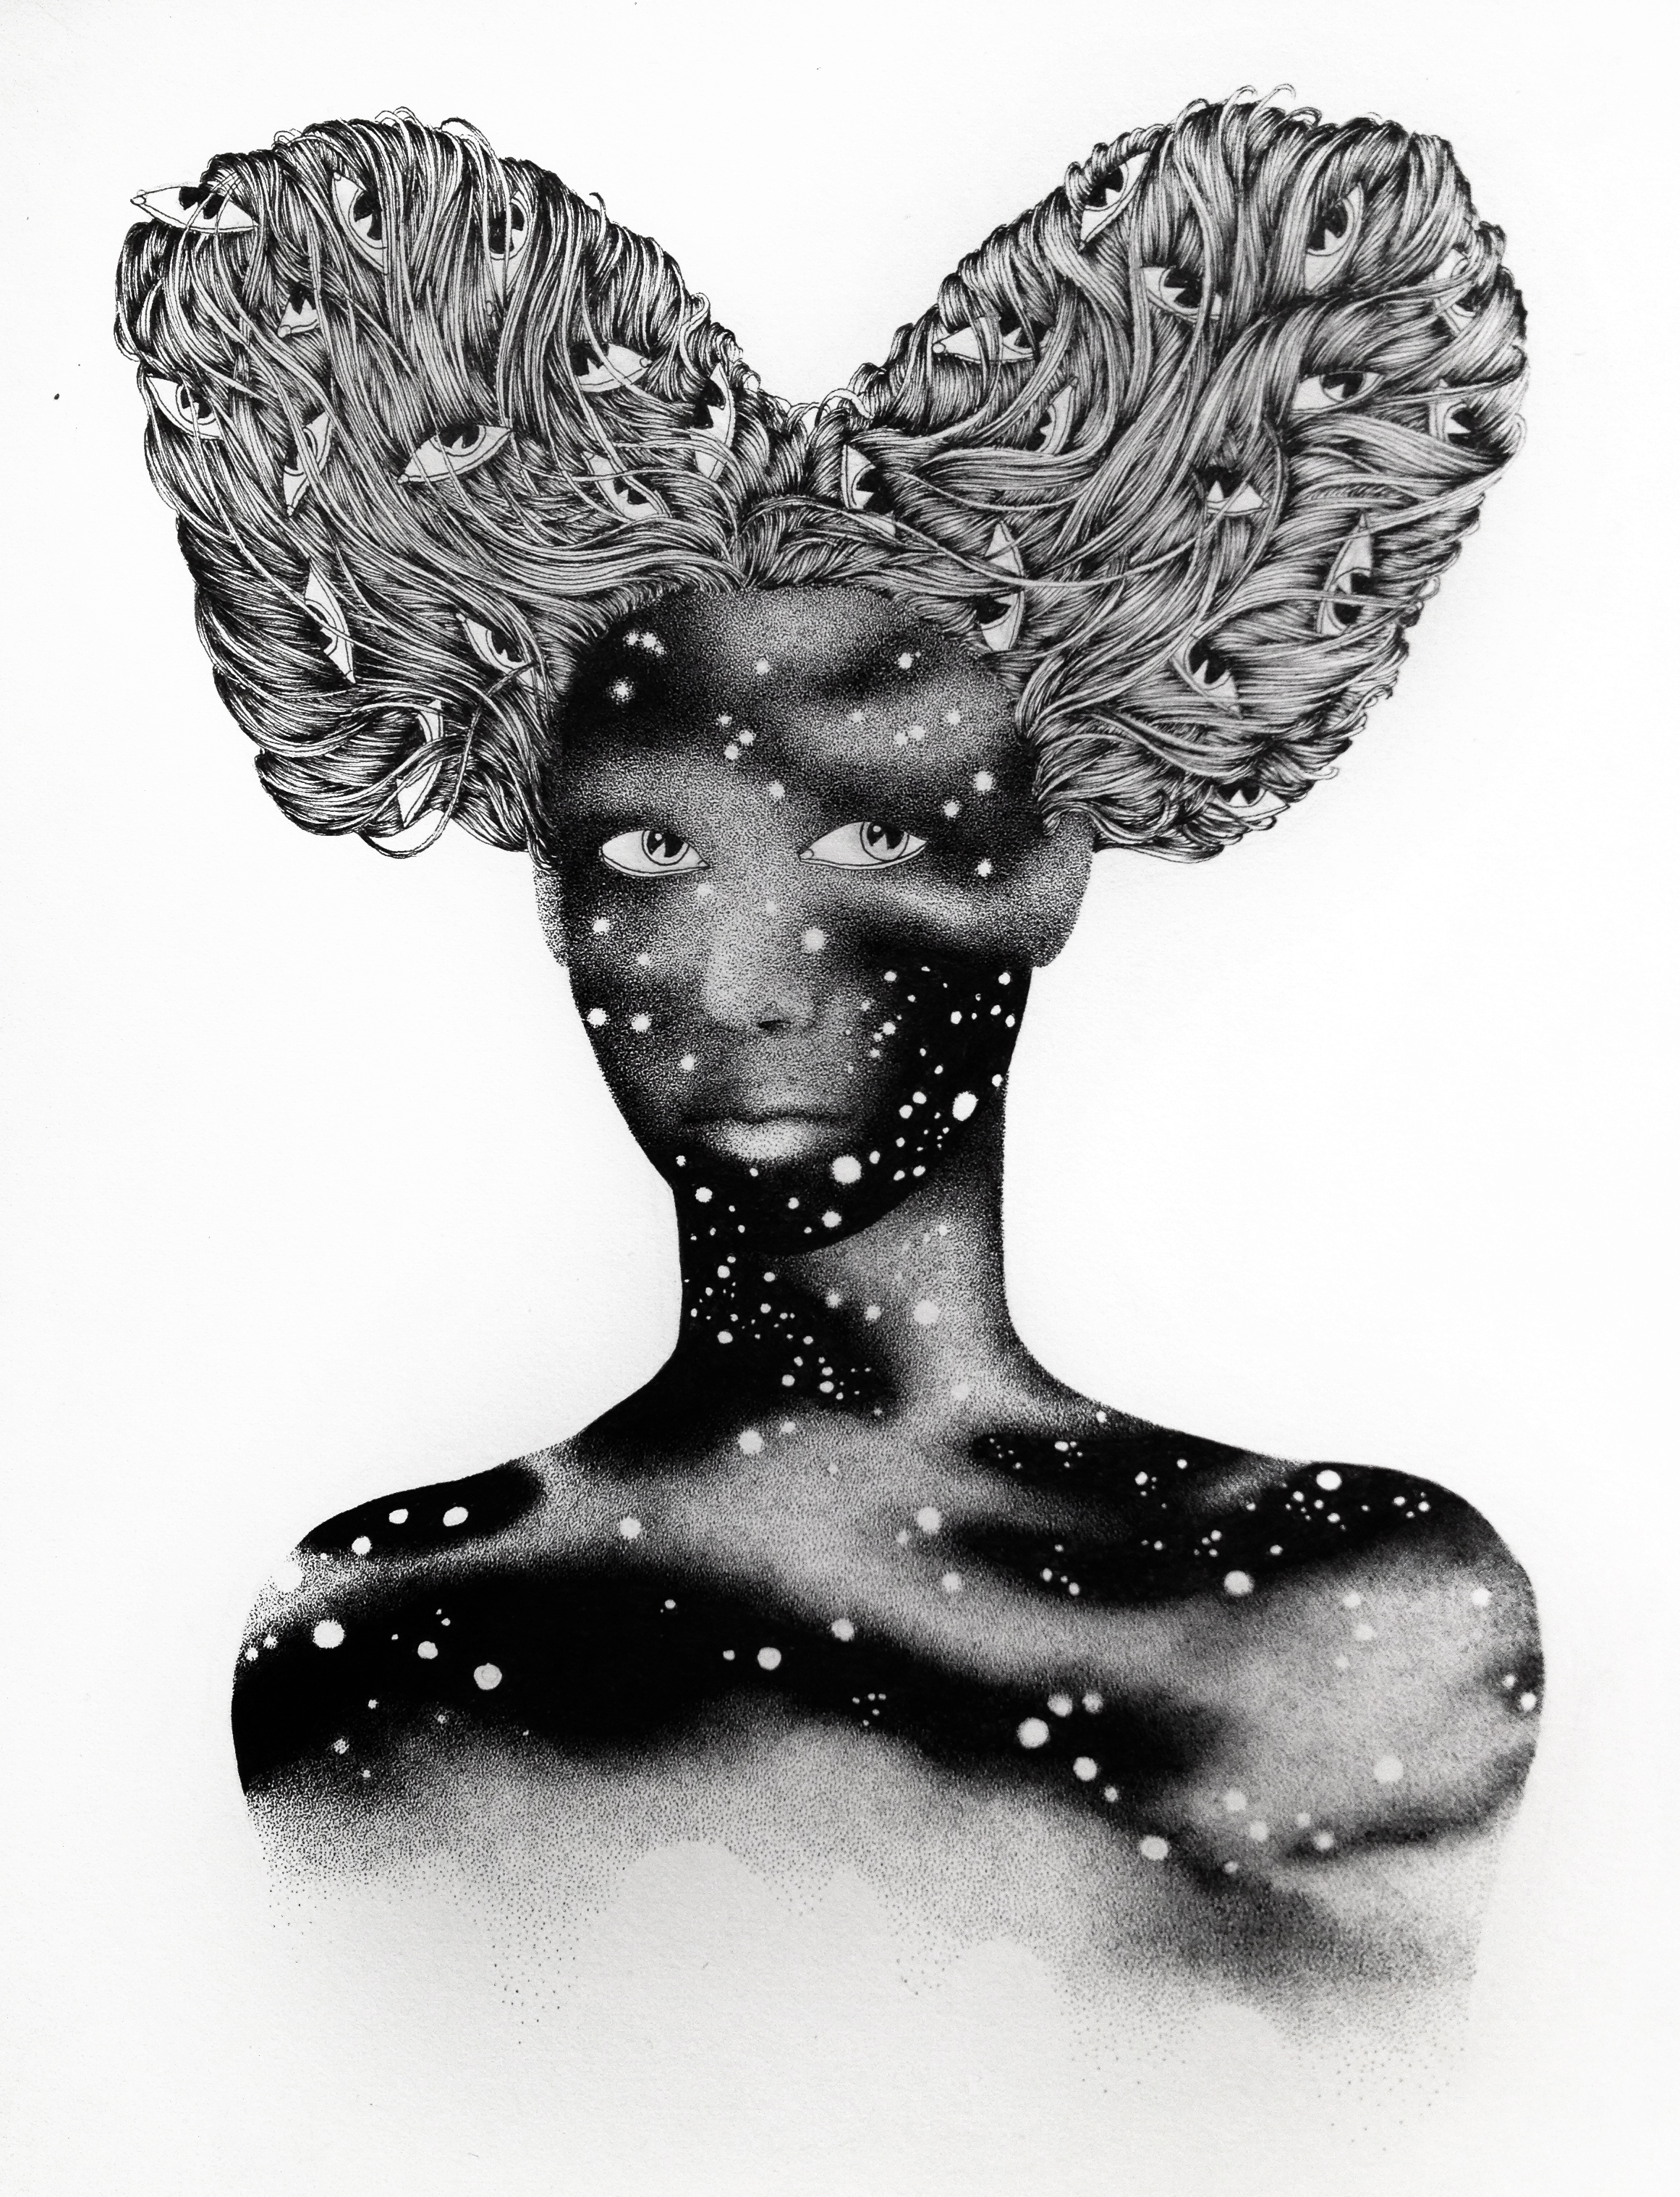 #URBANINTIMACY #surreal #minisizeart, #drawing #London #exhibition #noumeda #cottonpaper #artonpaper #blackandwhite #art #contemporary #drawing #dessincontemporain #italian #artist #coventgarden #thestrandgallery #londoncontemporary